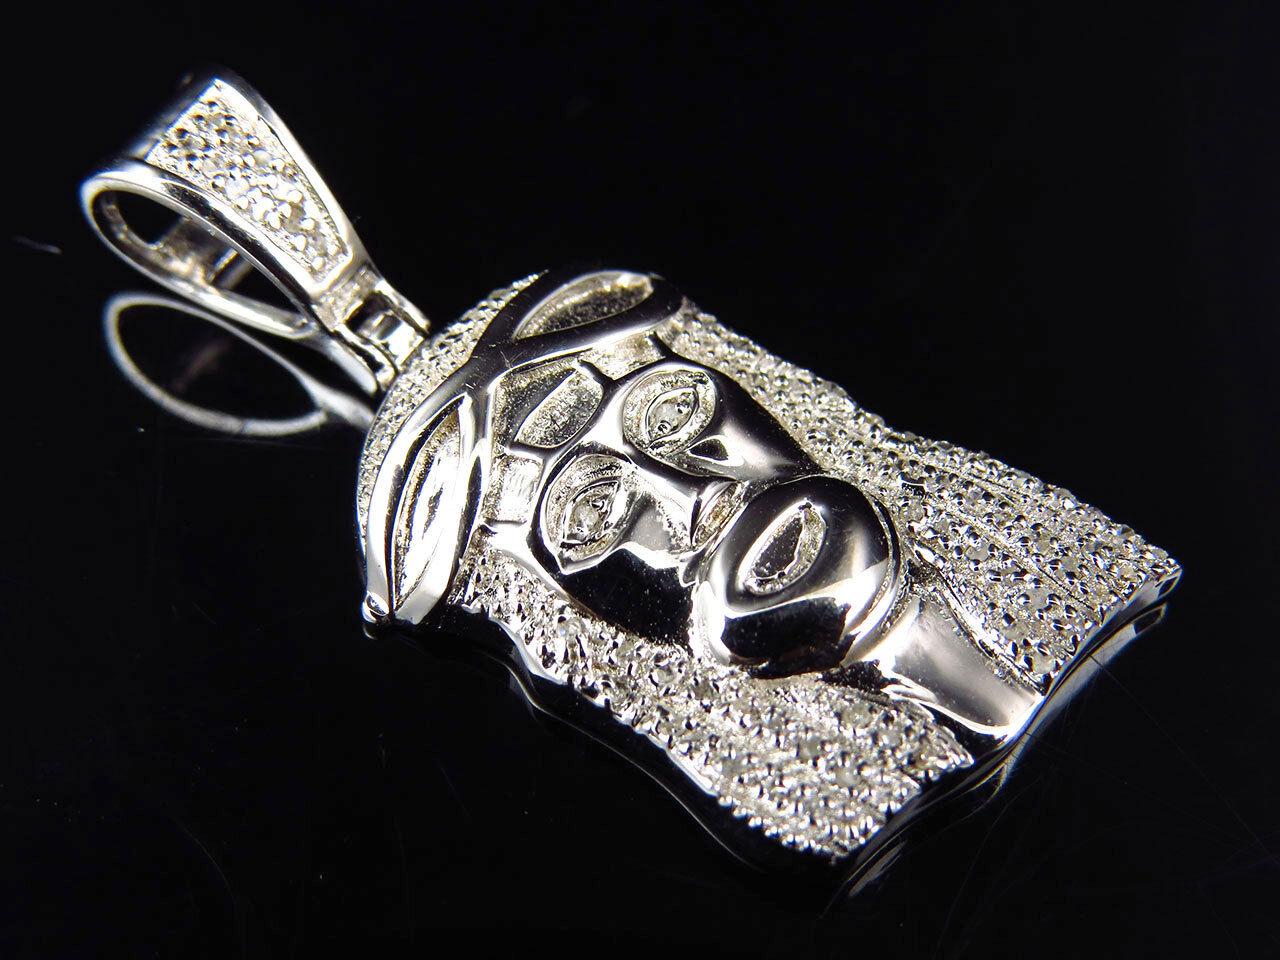 Genuine Diamond Cautious Jesus Piece Pendant In White gold Finish 0.50Ct 1.25